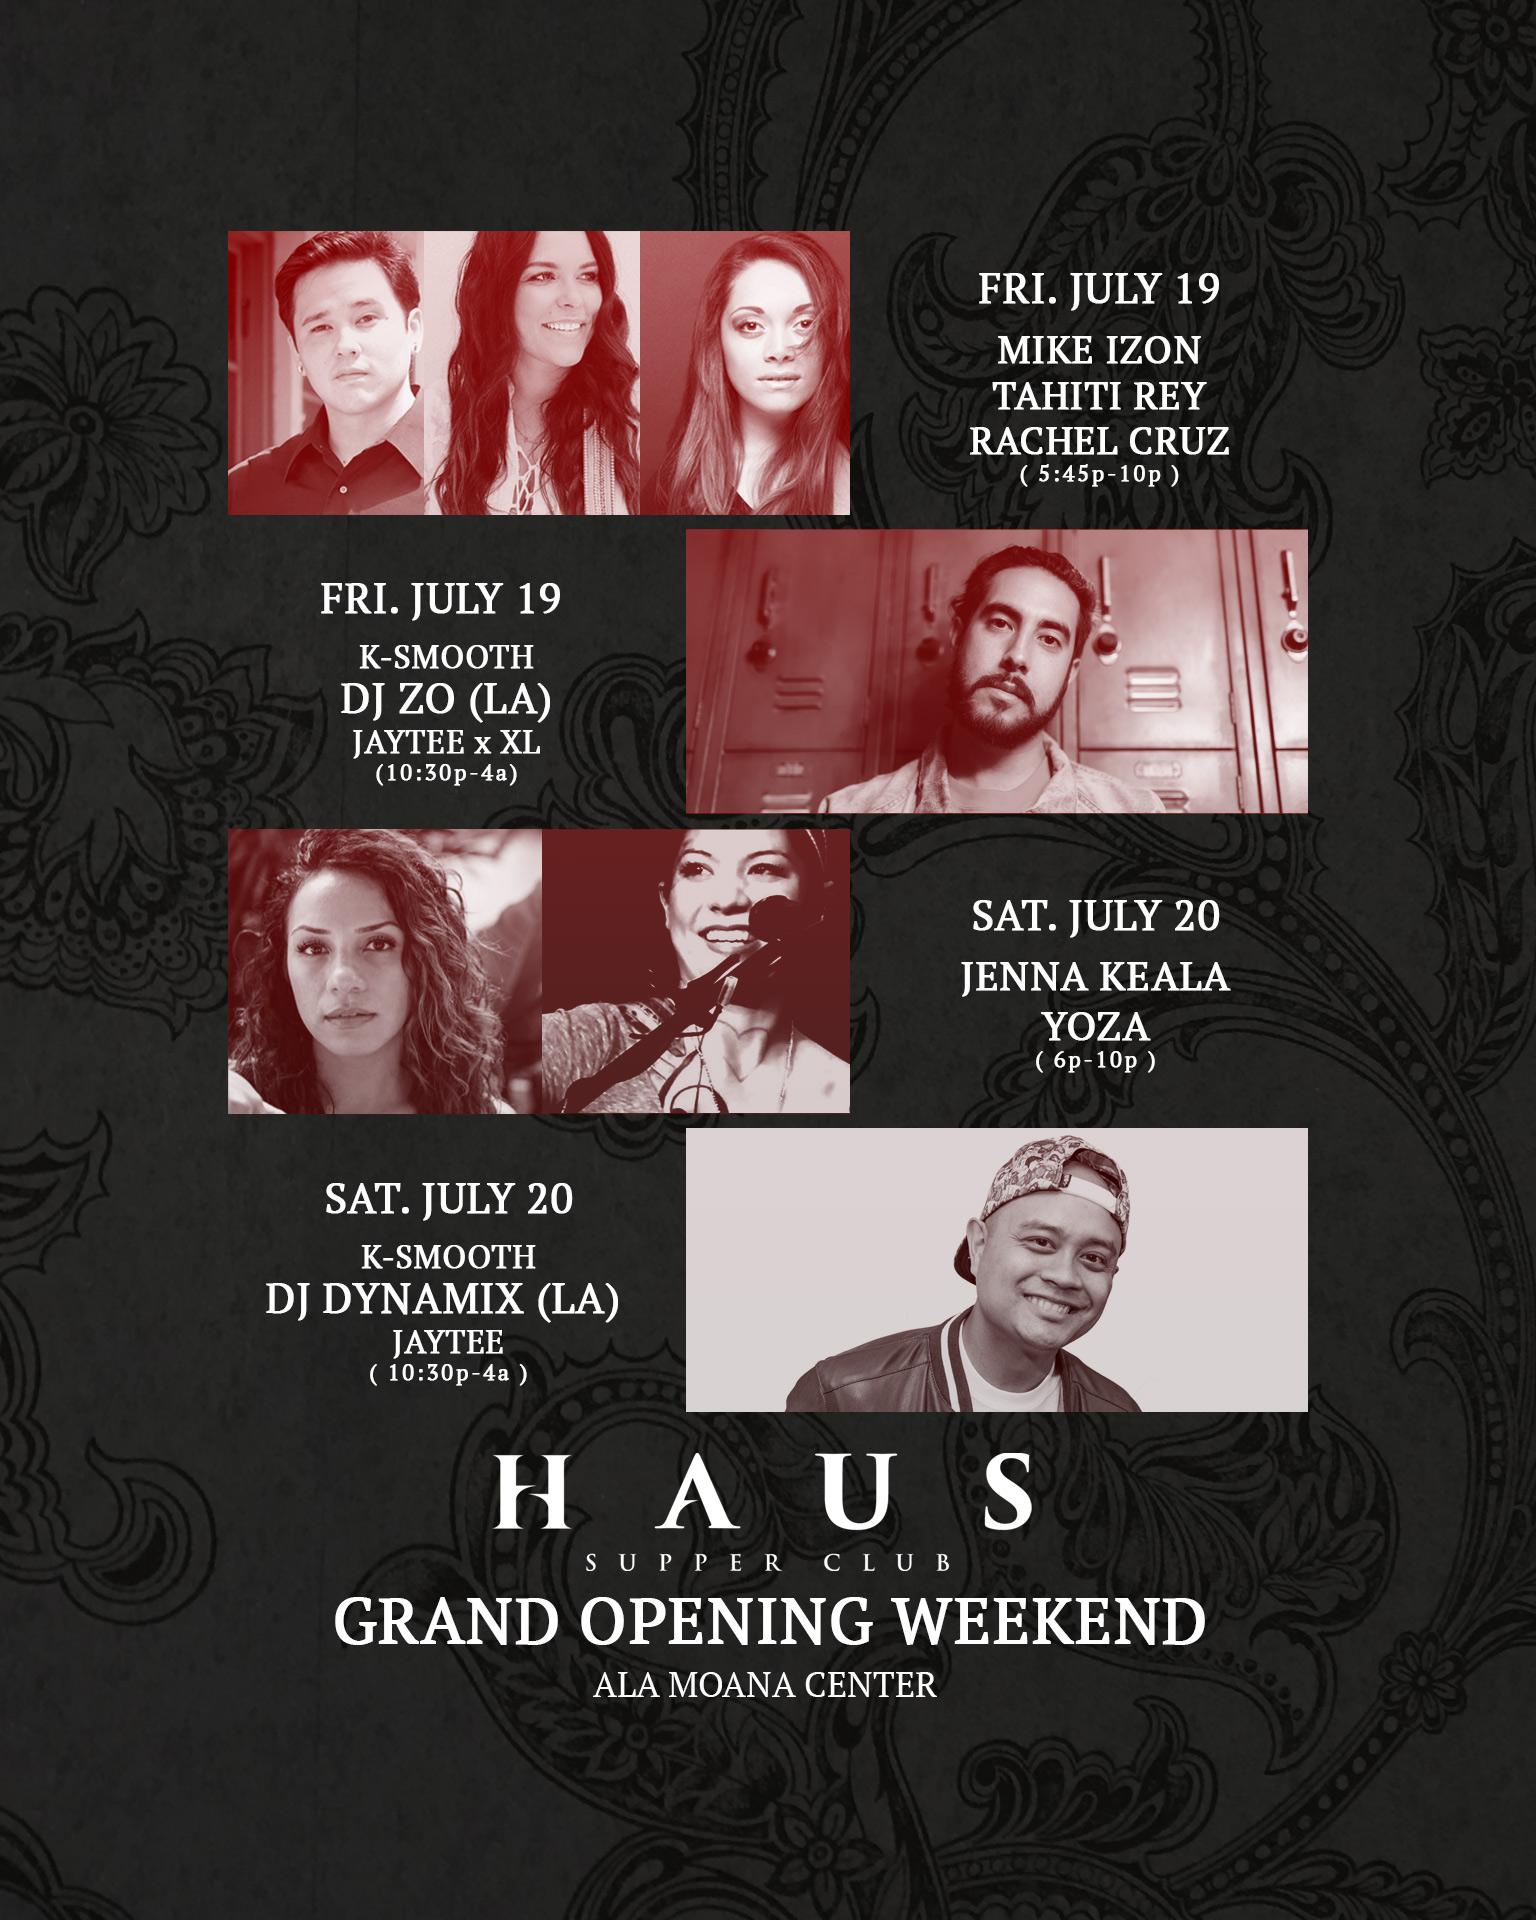 haus-grand-opening-weekend-friday-lineup-red.jpg